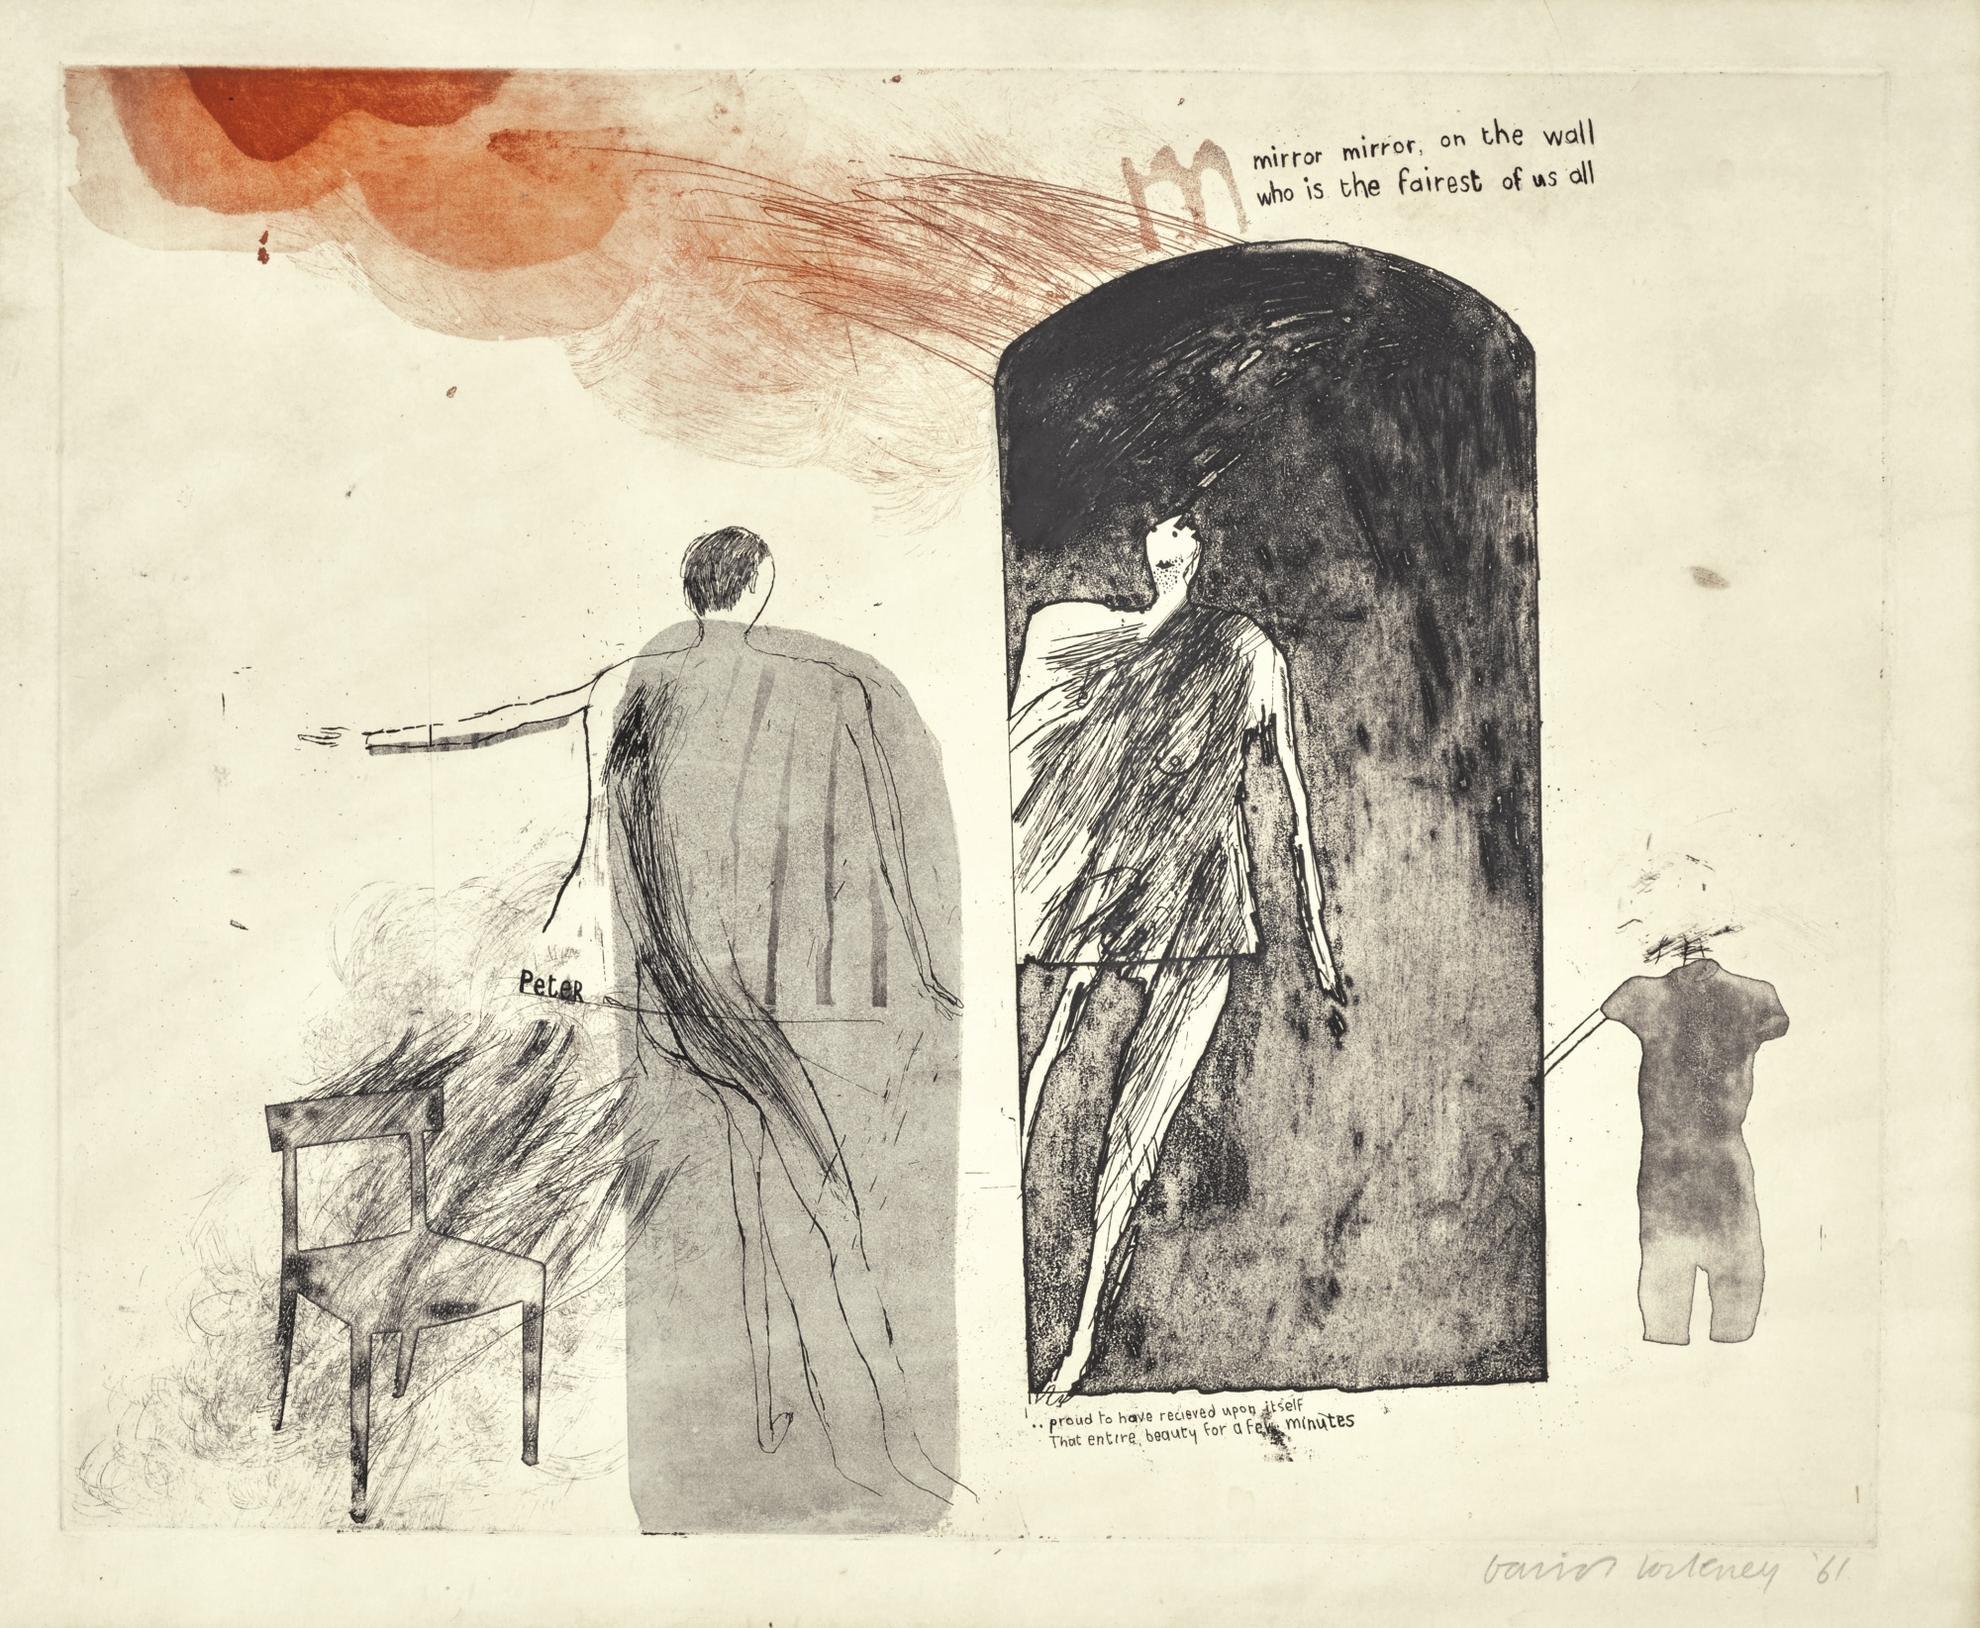 David Hockney-Mirror, Mirror On The Wall (S.A.C., Mca Tokyo 10)-1961